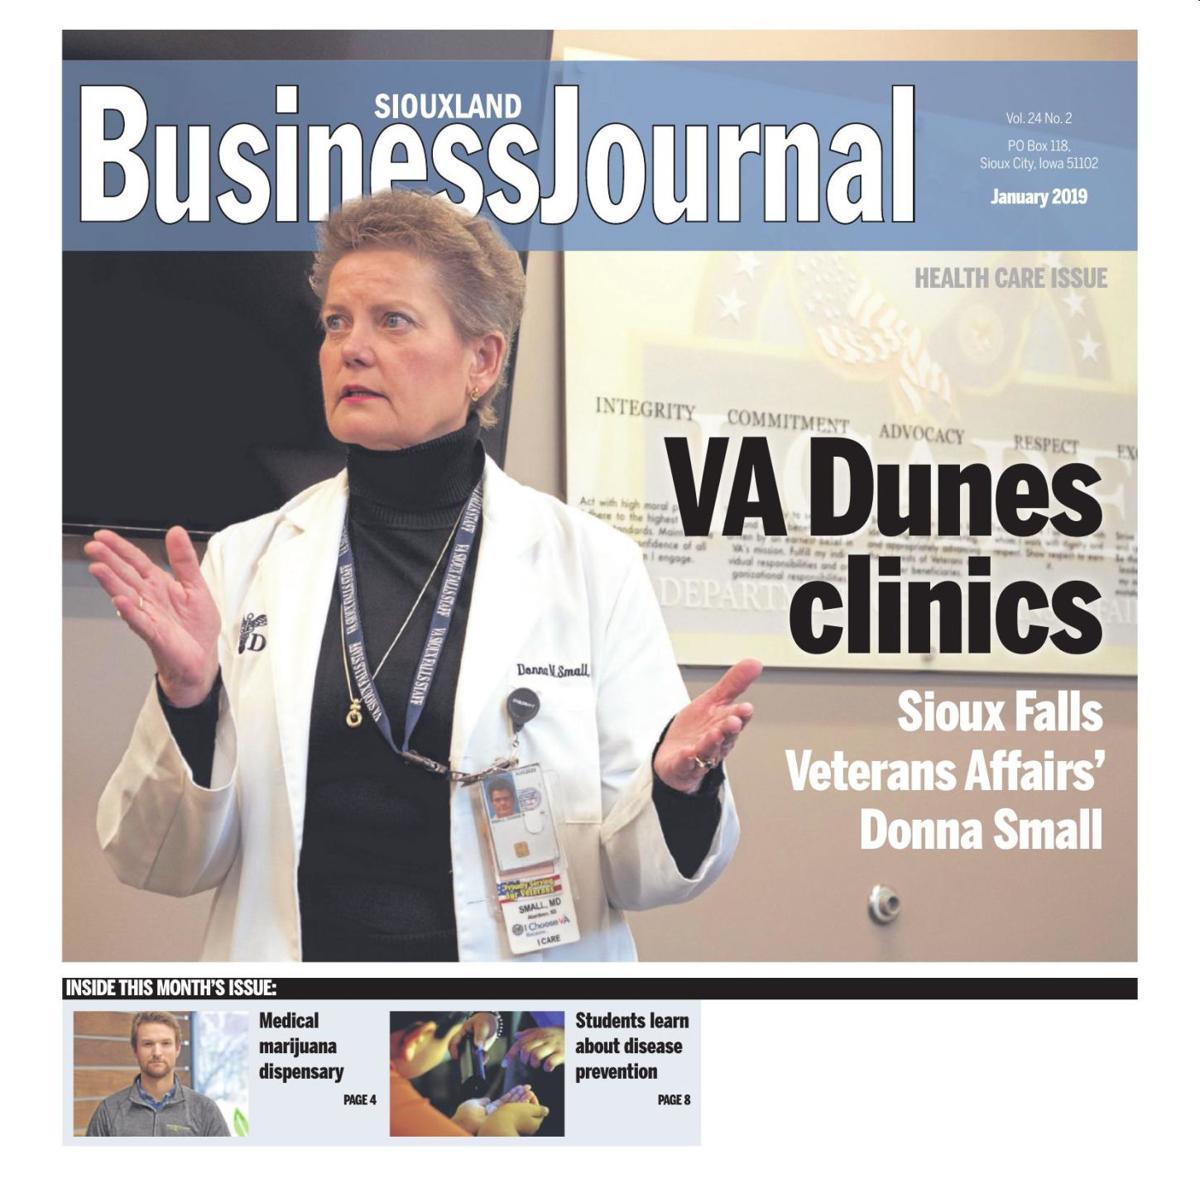 Siouxland Business Journal - January 2019